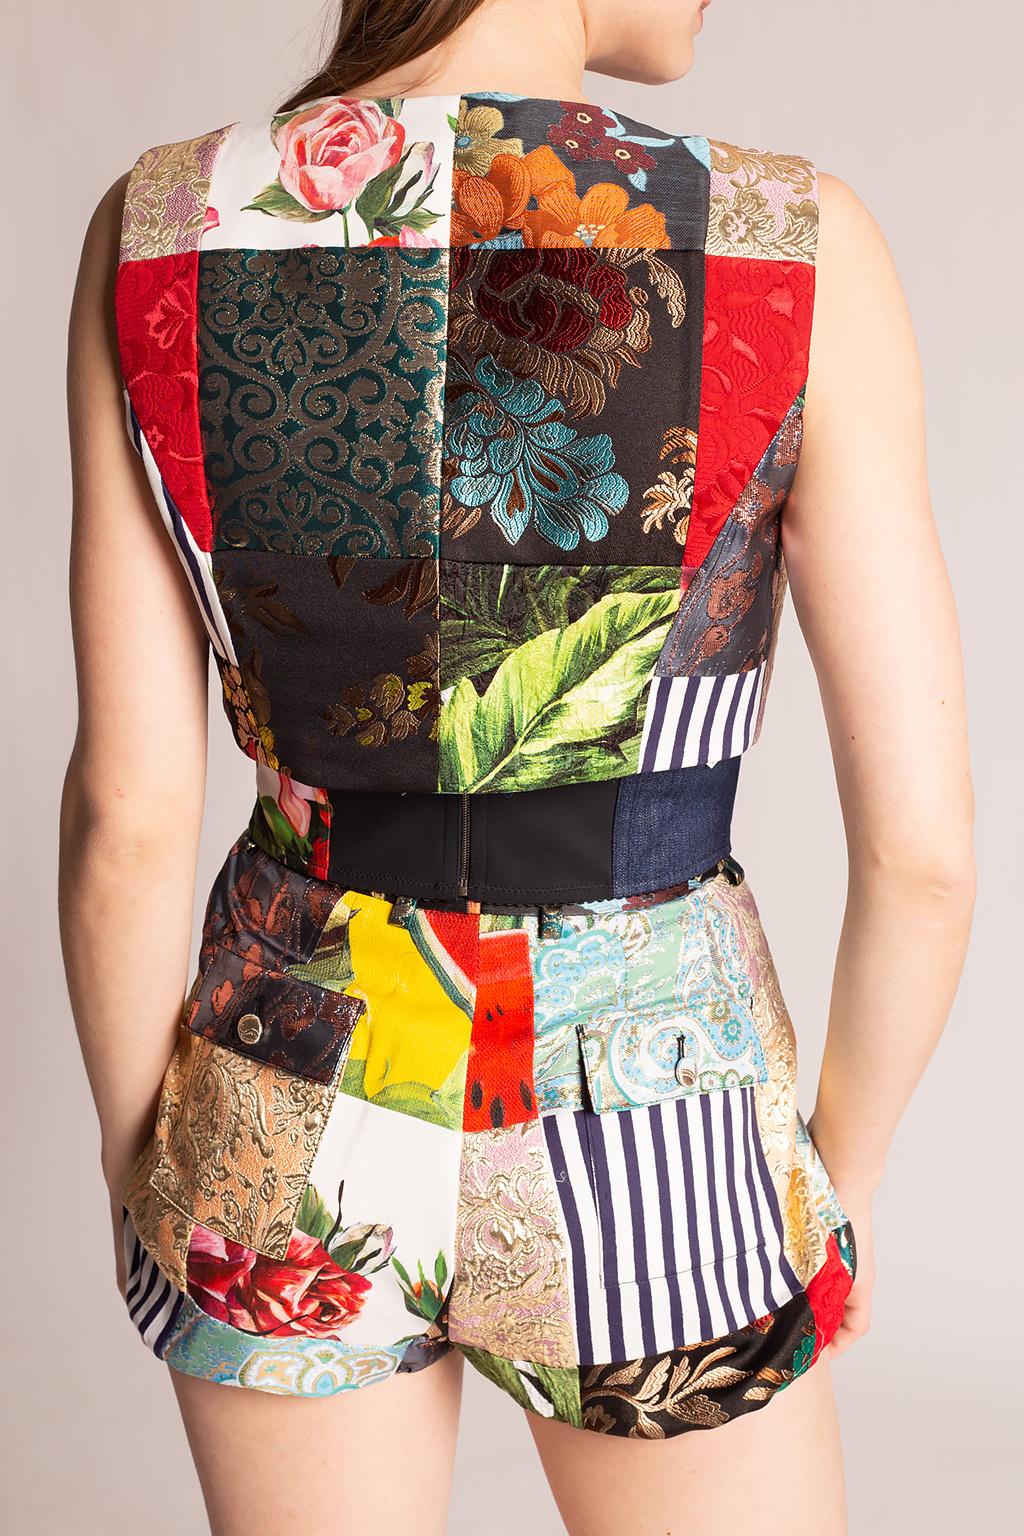 Dolce & Gabbana 图案背心